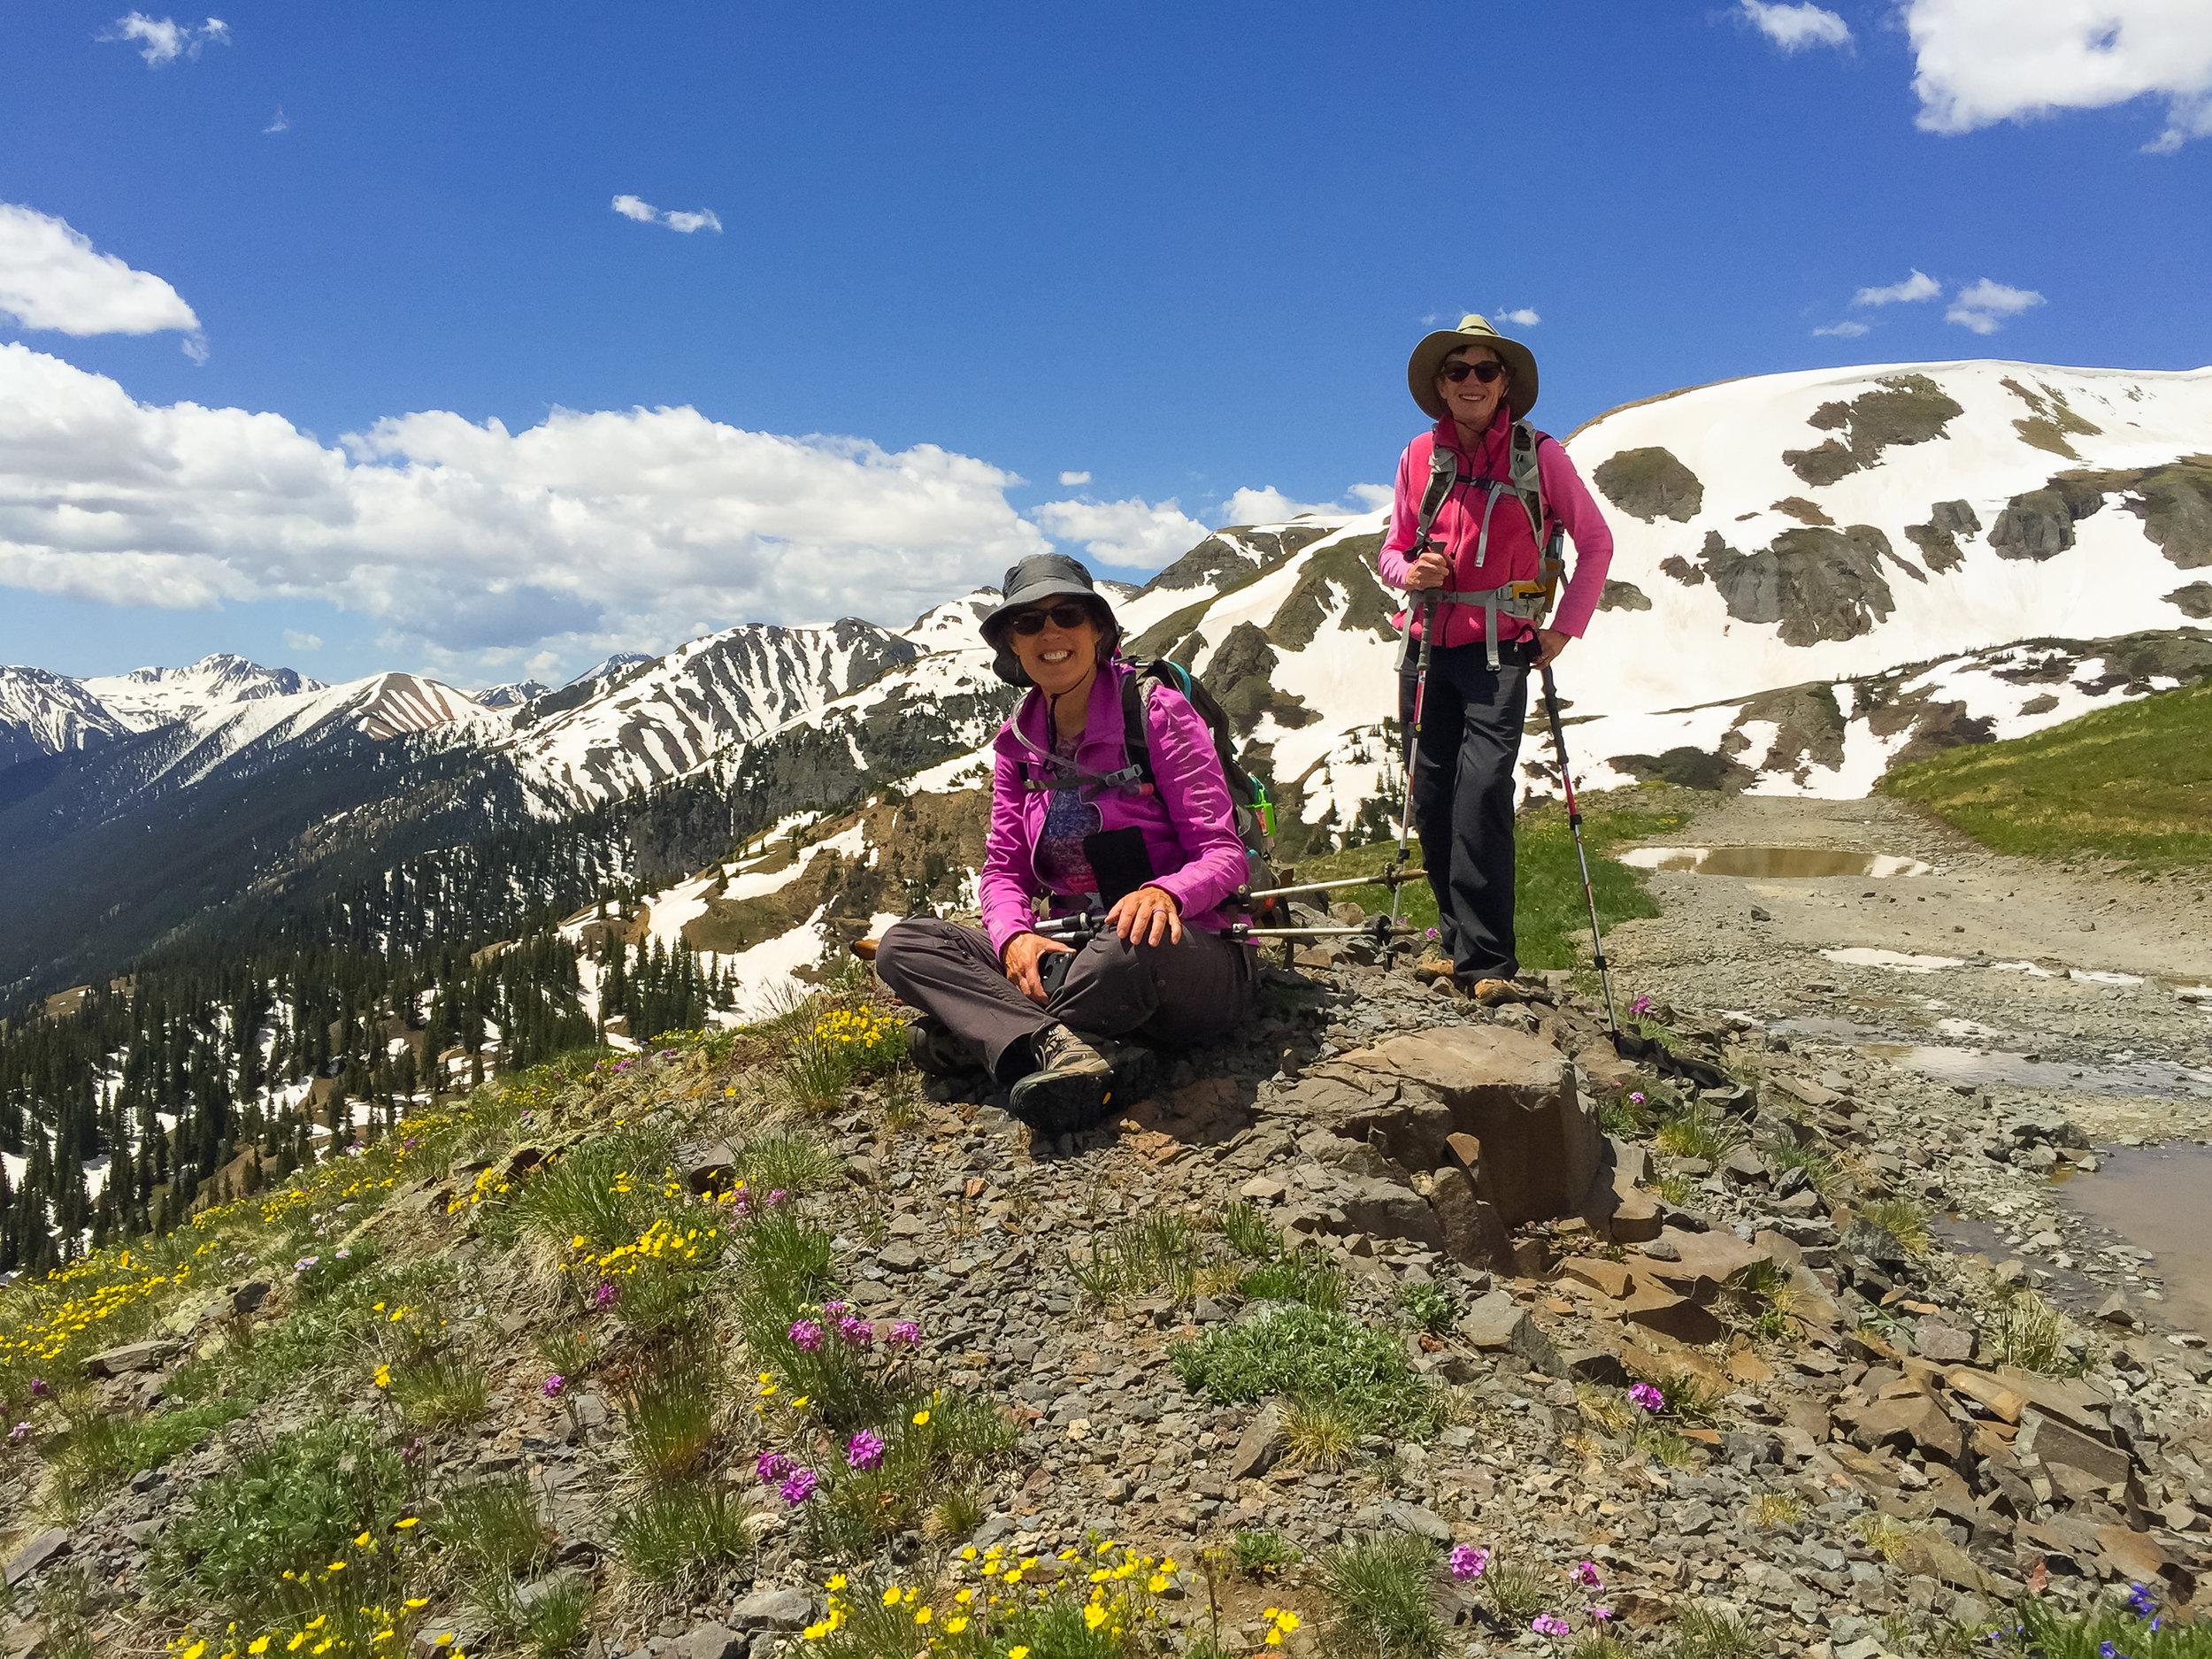 Gina & Barbara catch their breath and enjoy the views